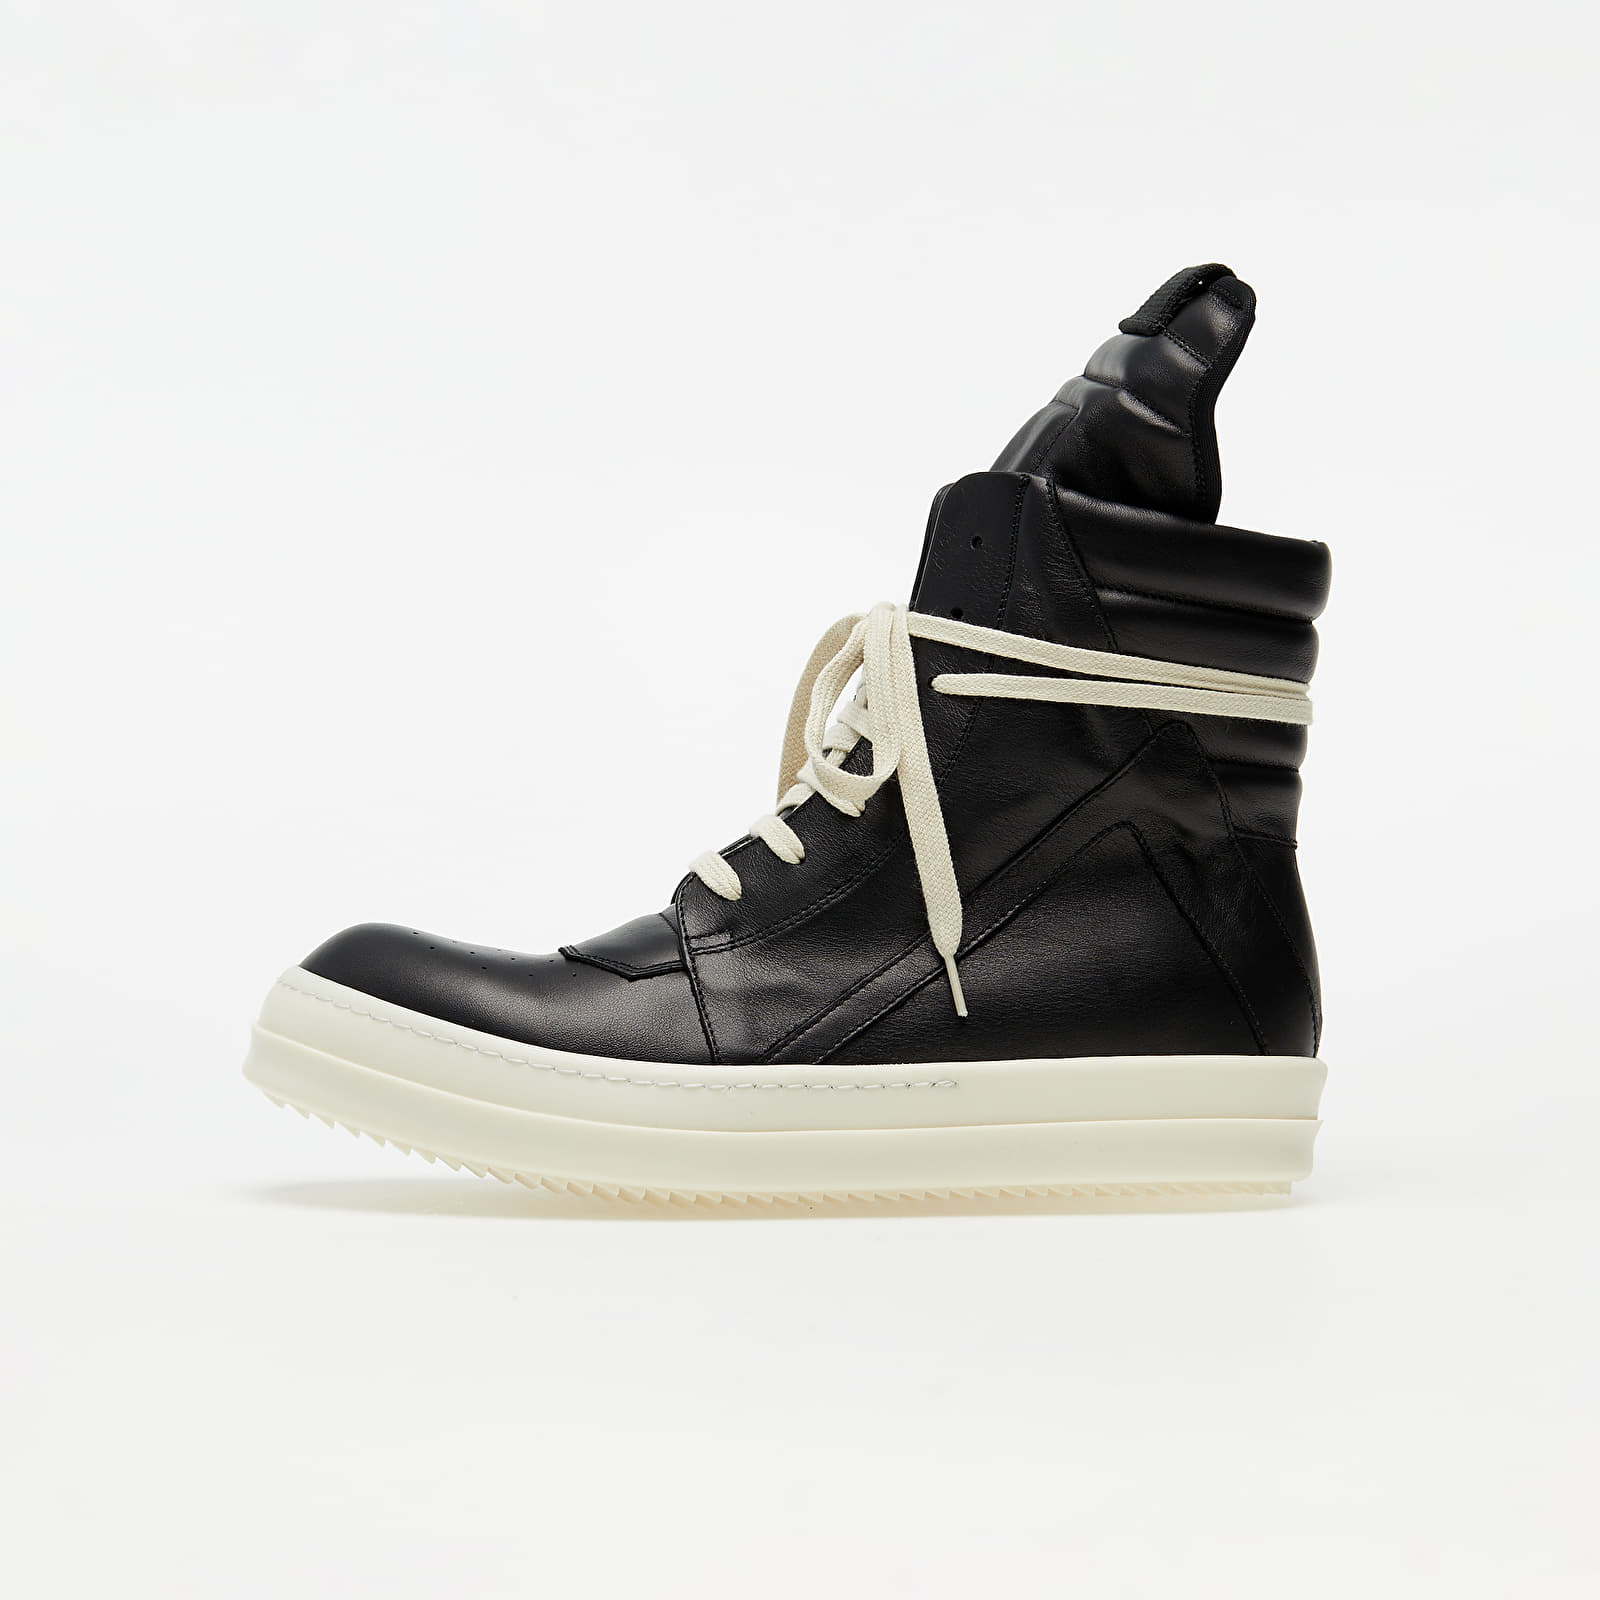 Férfi cipők Rick Owens Geobasket Black/ Black/ White